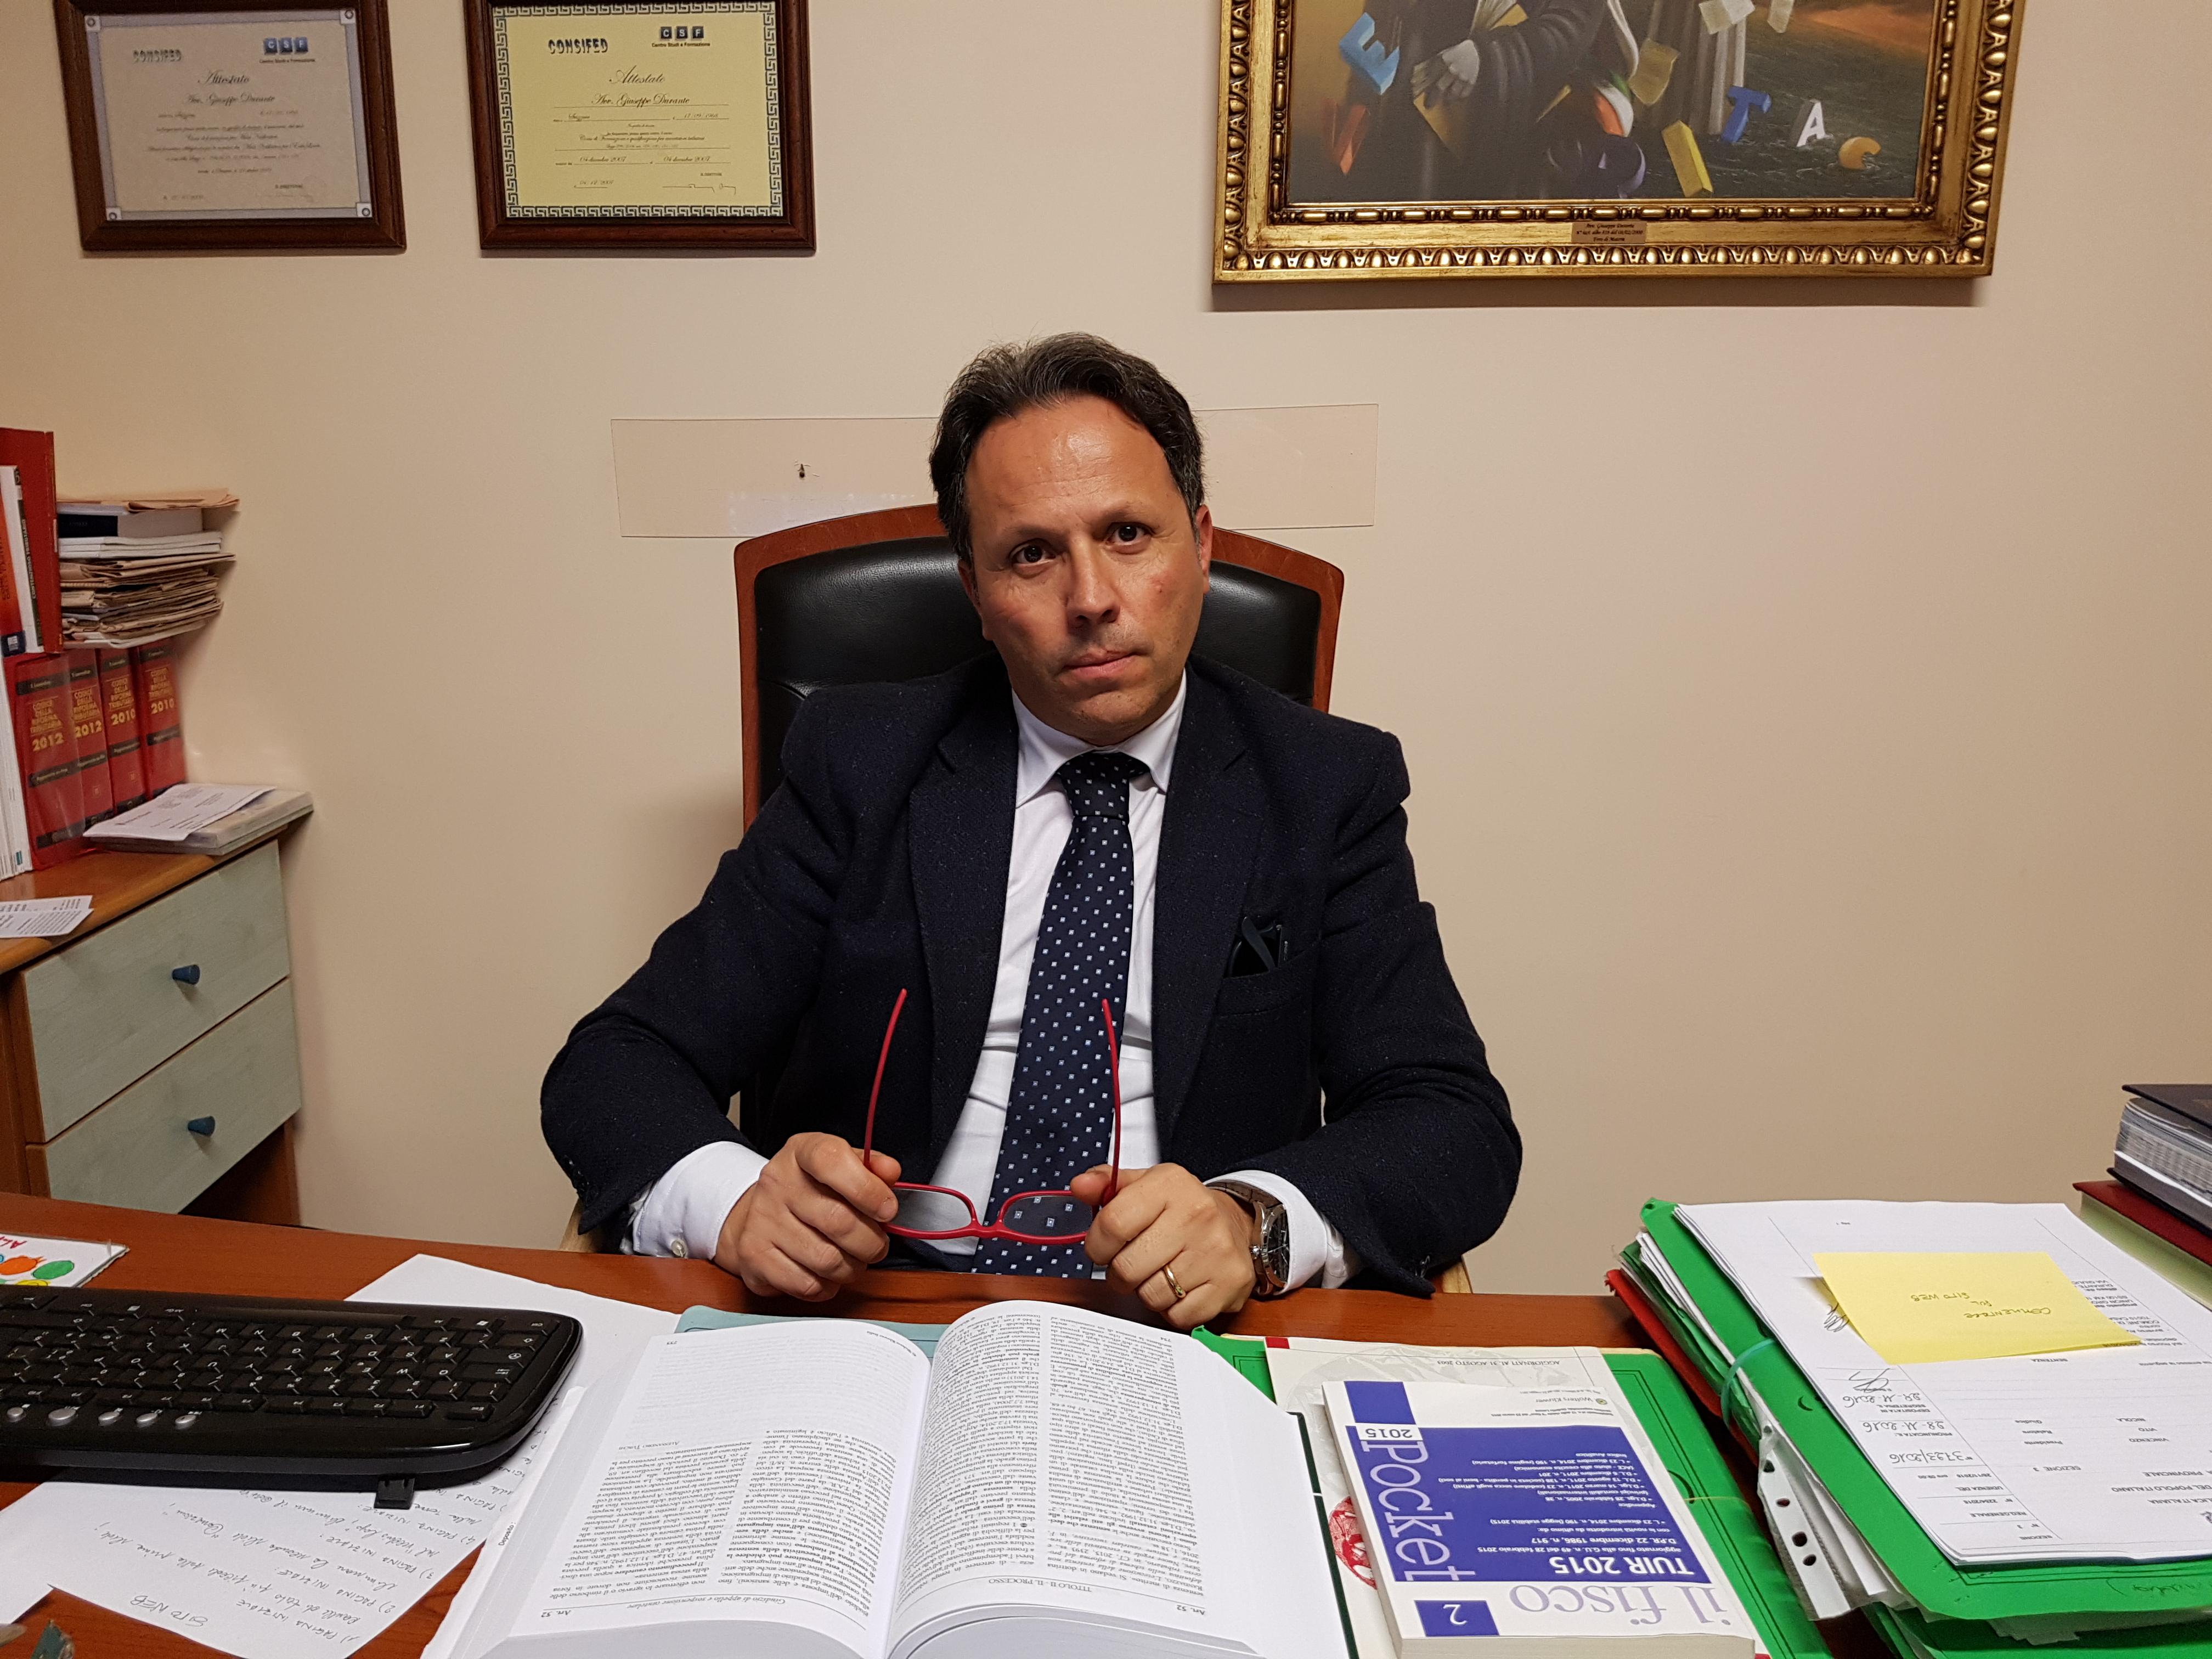 Avvocato Giuseppe Durante